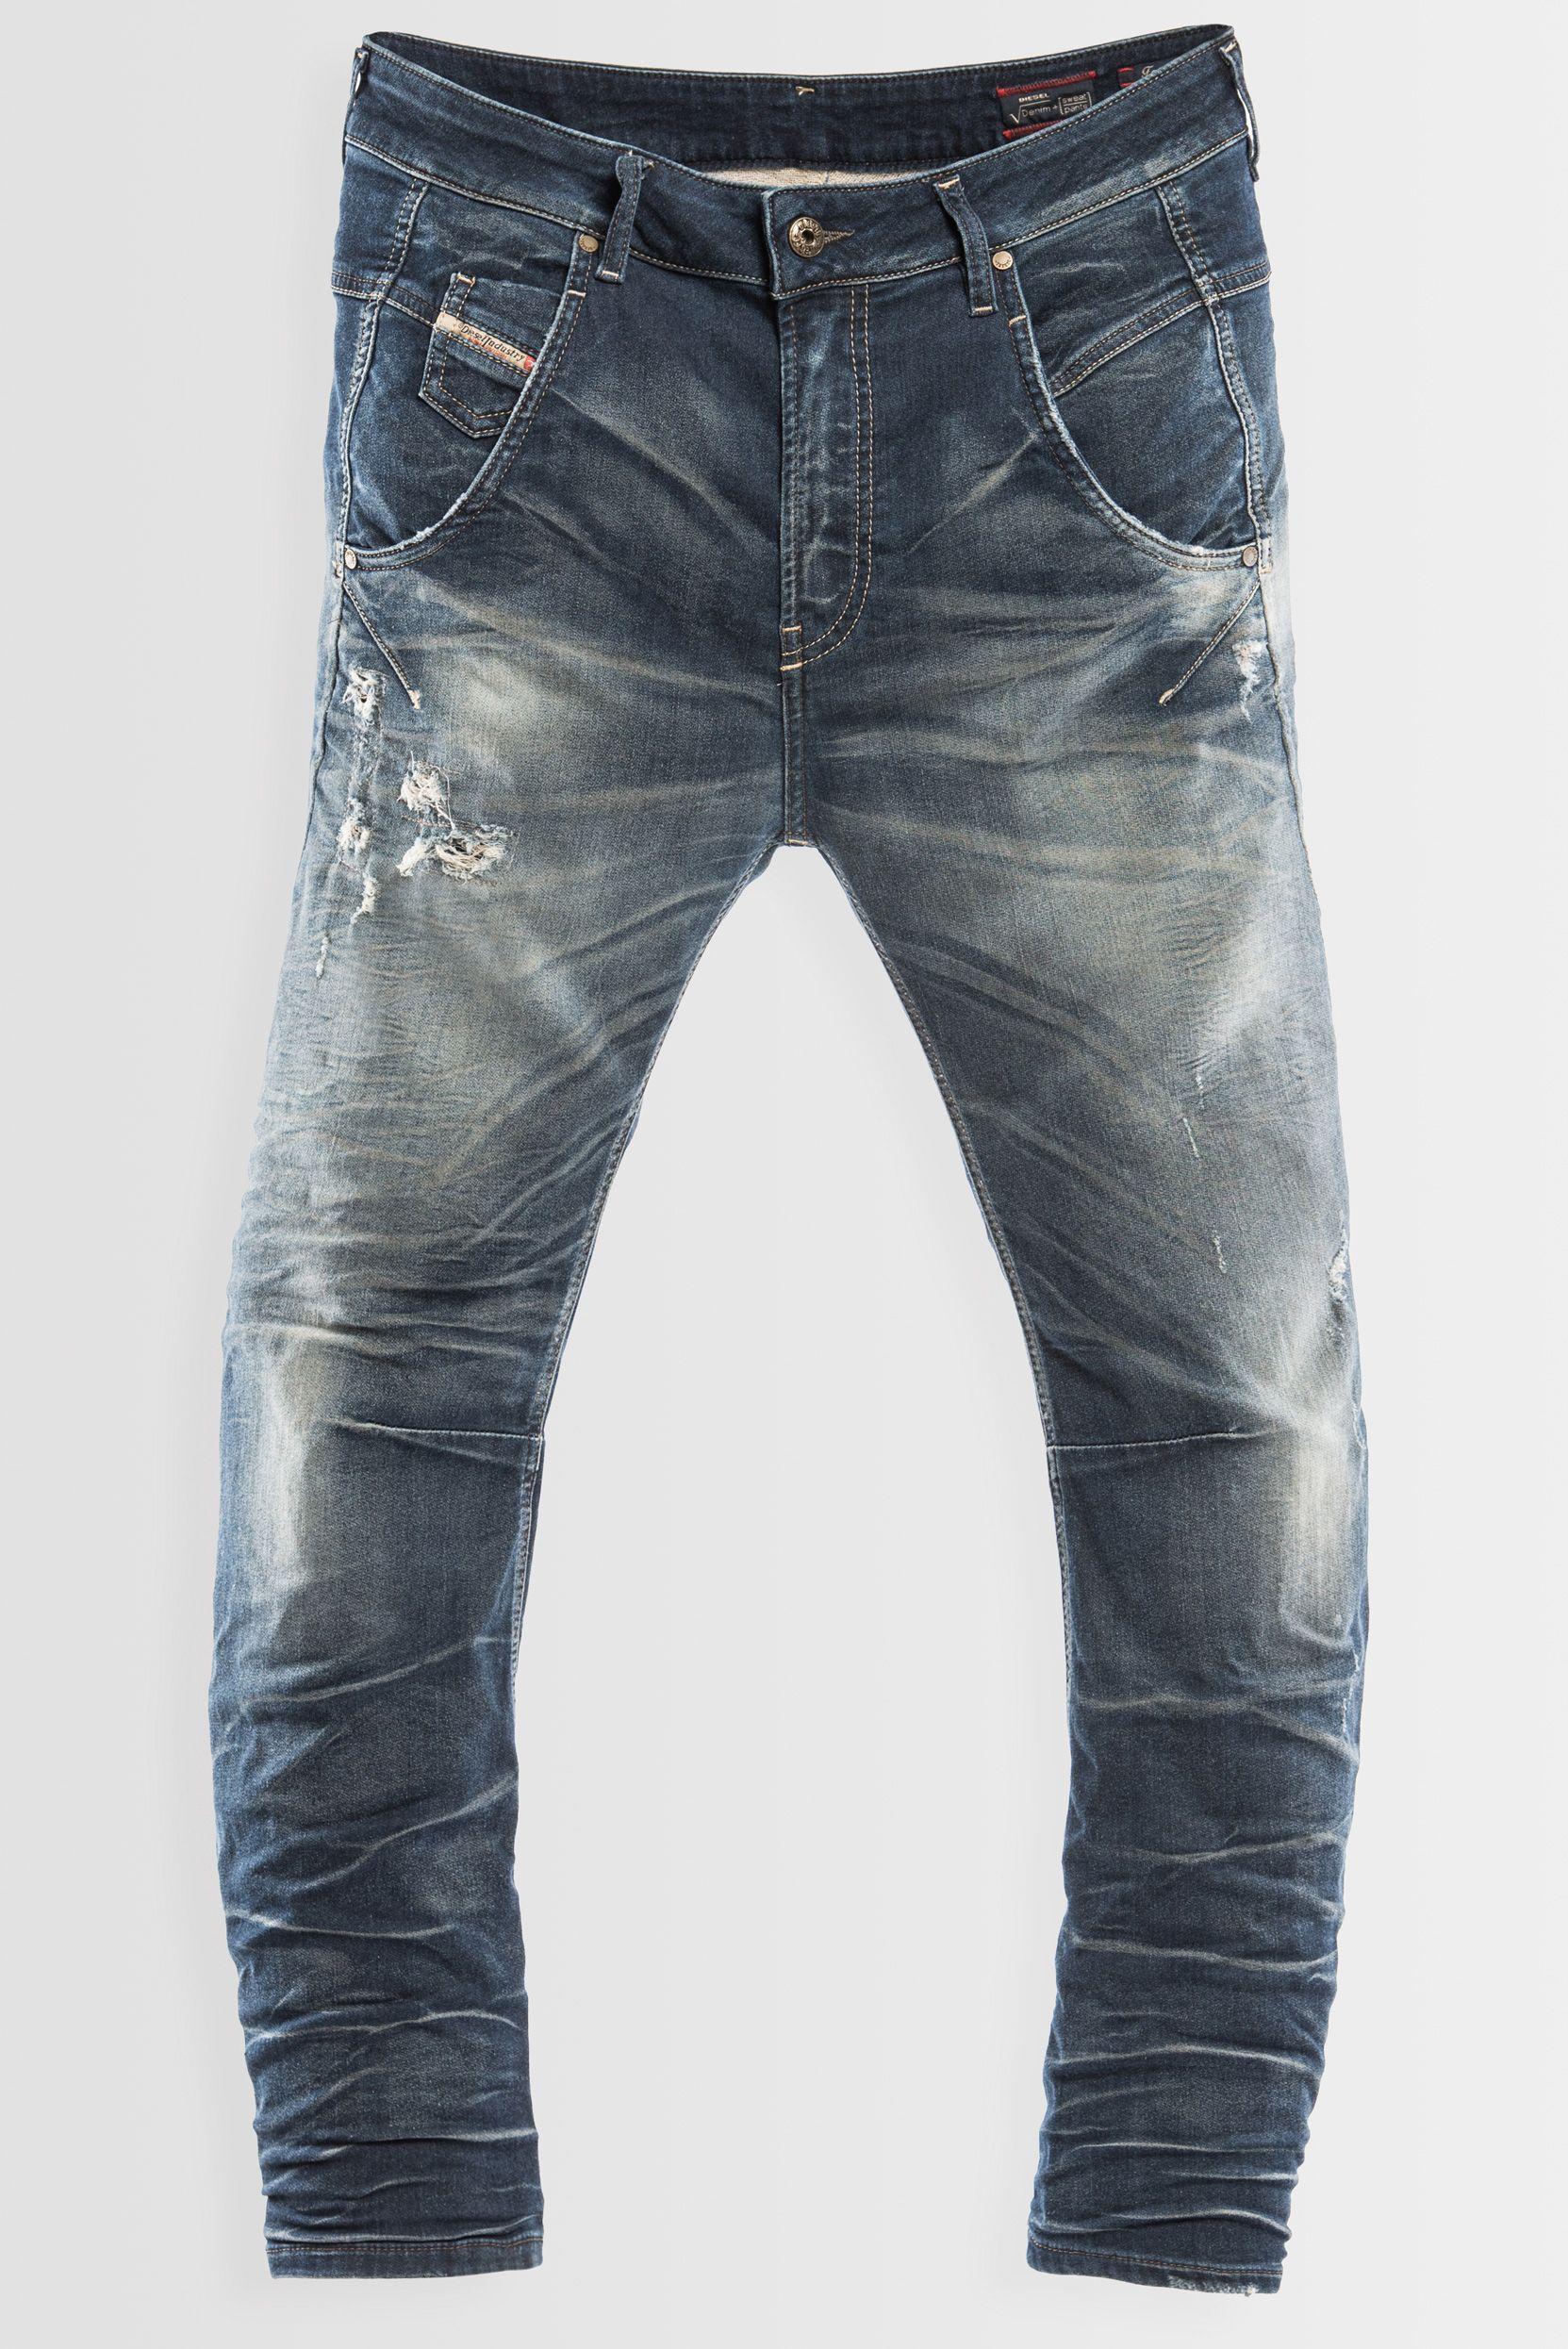 1390c607 Diesel #jeans: FAYZA-NE 0604N #JoggJeans | denim stuff | Denim pants ...